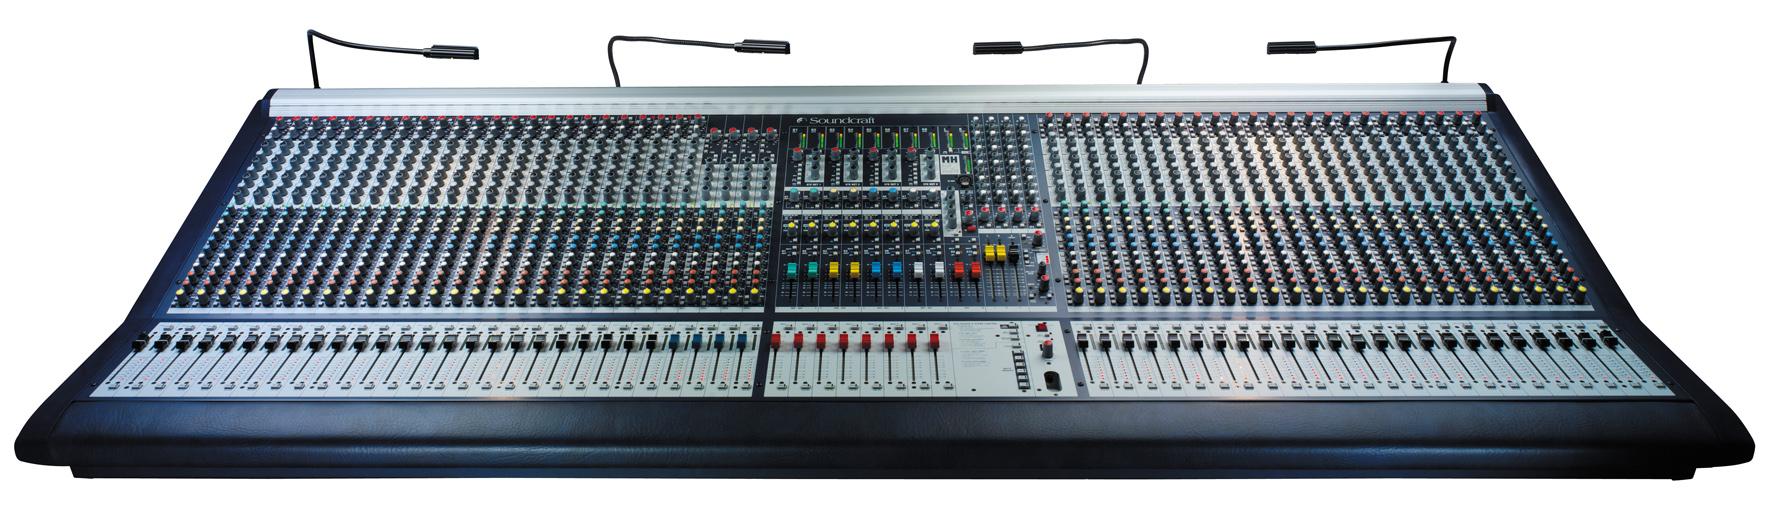 Mh2 Soundcraft Professional Audio Mixers